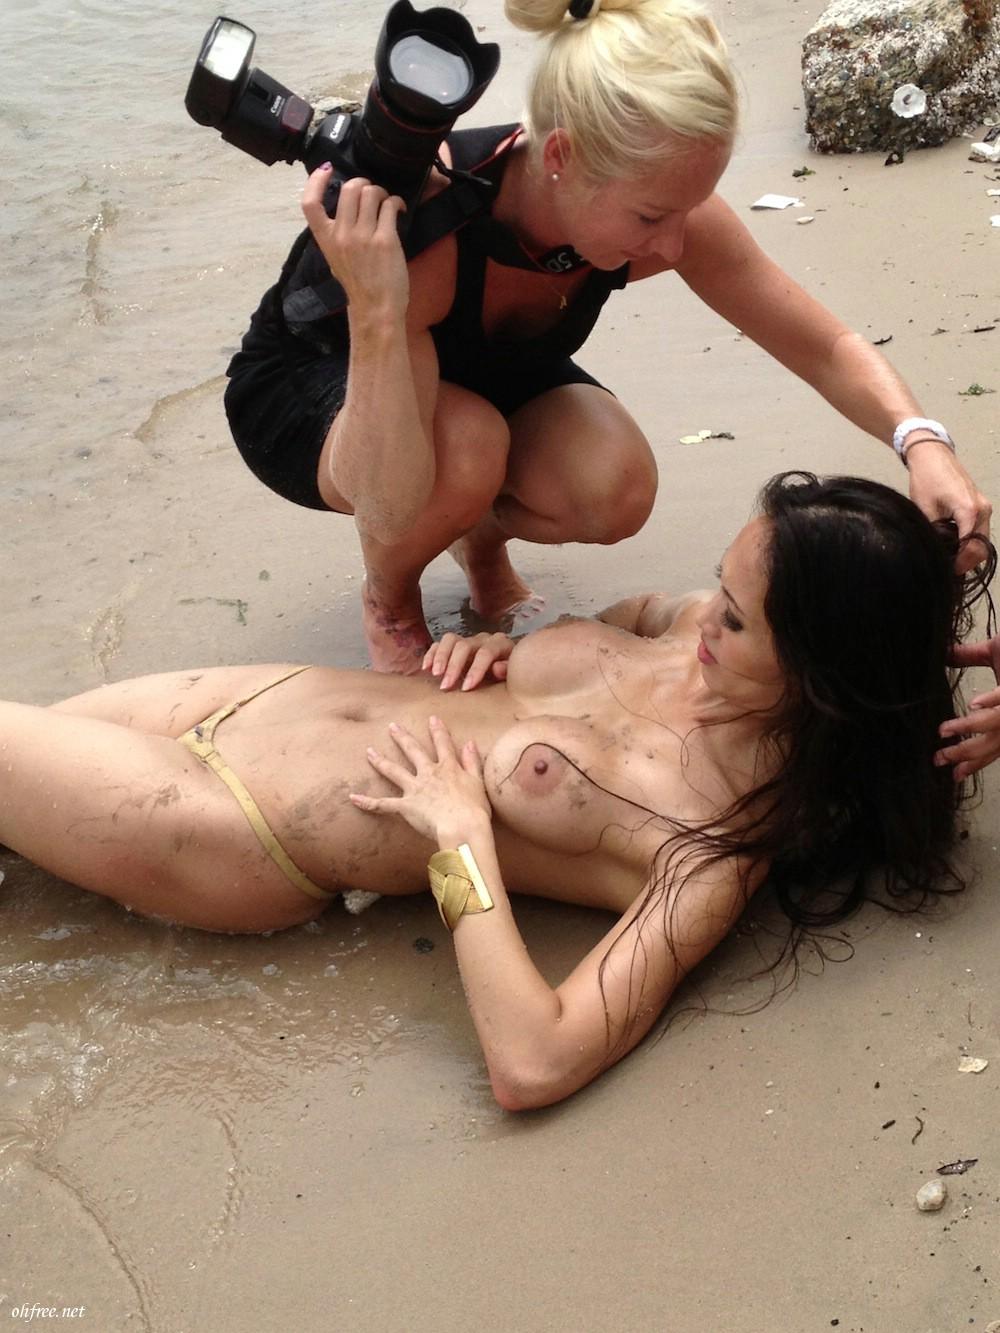 DJ-Angie-Vu-Ha-Naked-Photos-www-ohfree-net-077